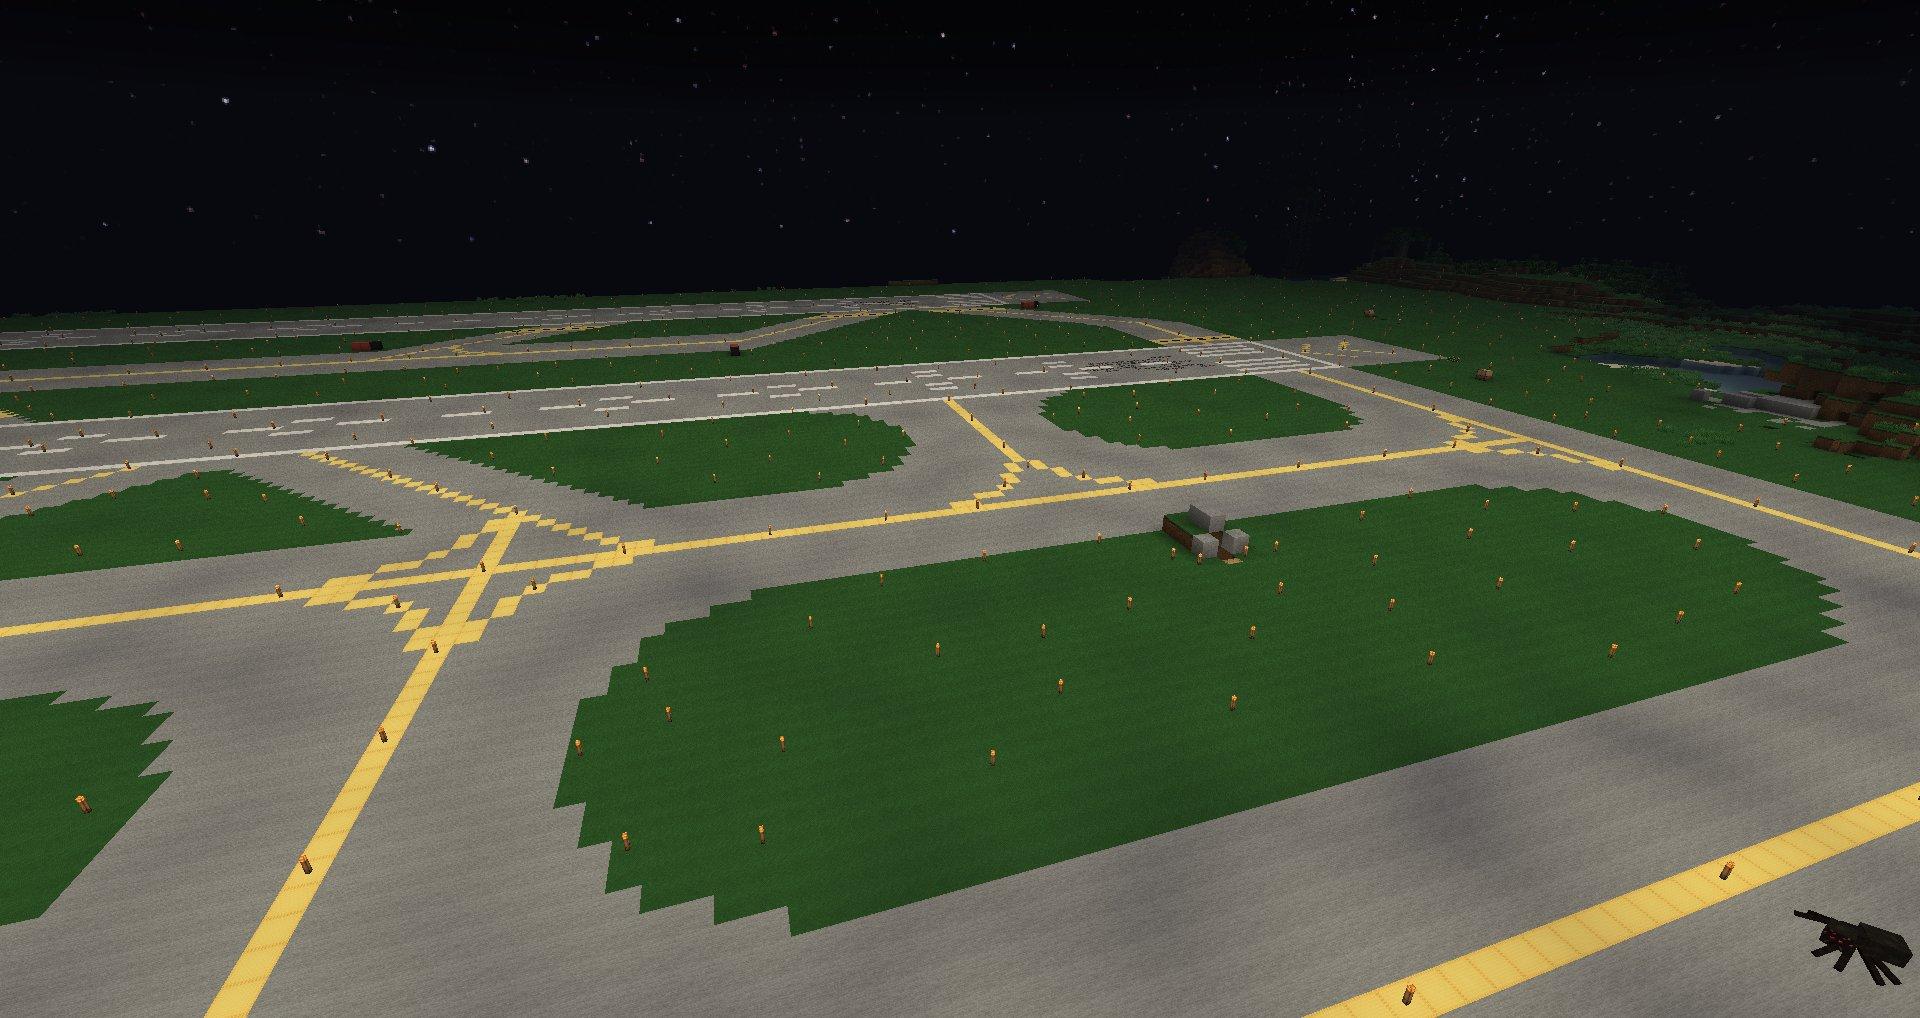 [PROJET] Aéroport International de Rodwin. - Page 2 17dd8710-db9b-457b-80de-66e903848507